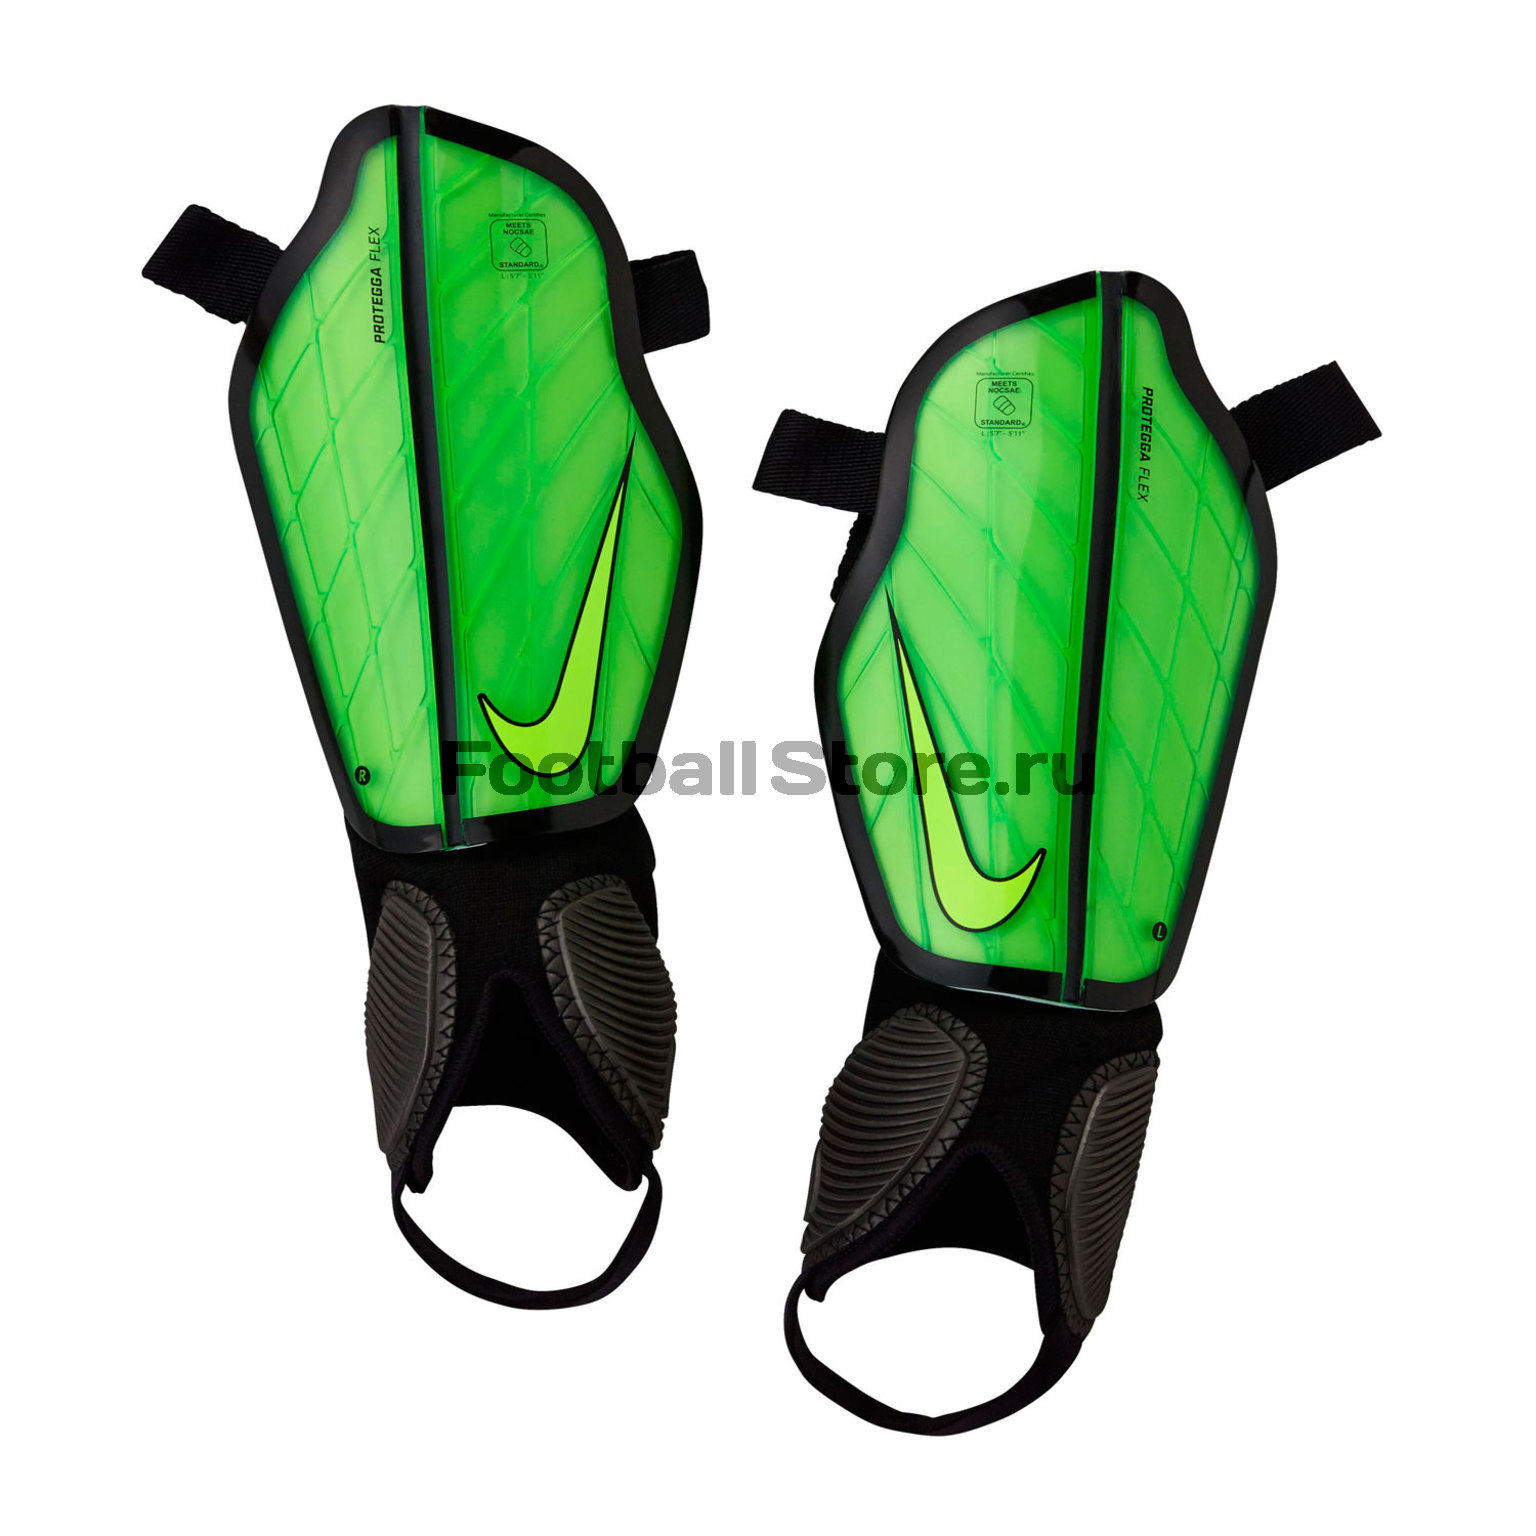 Защита ног Nike Щитки Nike Protegga Flex SP0313-336